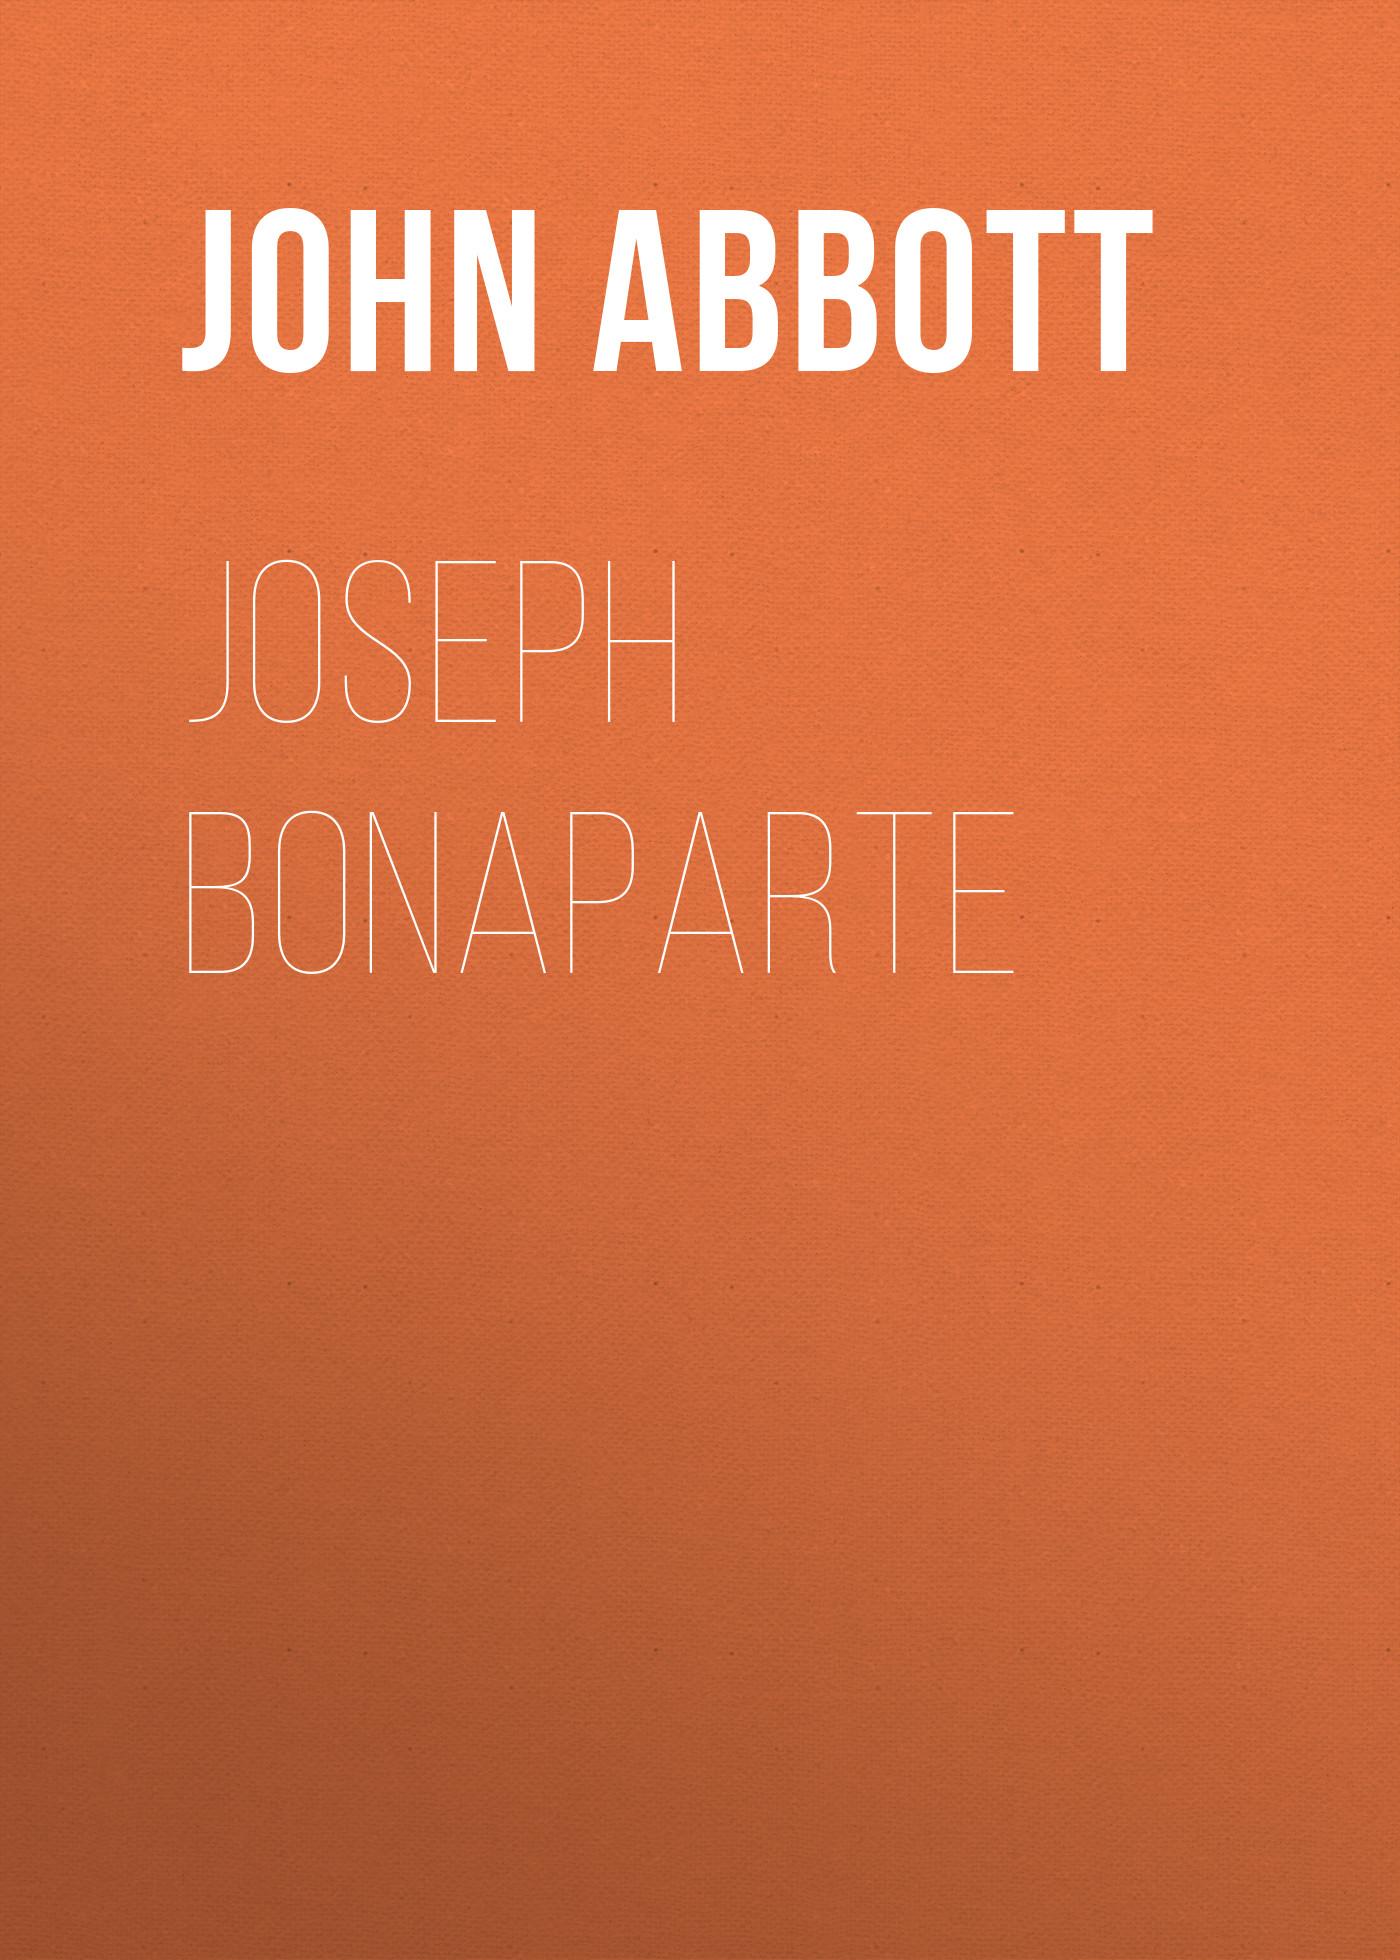 Фото - Abbott John Stevens Cabot Joseph Bonaparte cabot arthur tracy papers upon abdominal surgery